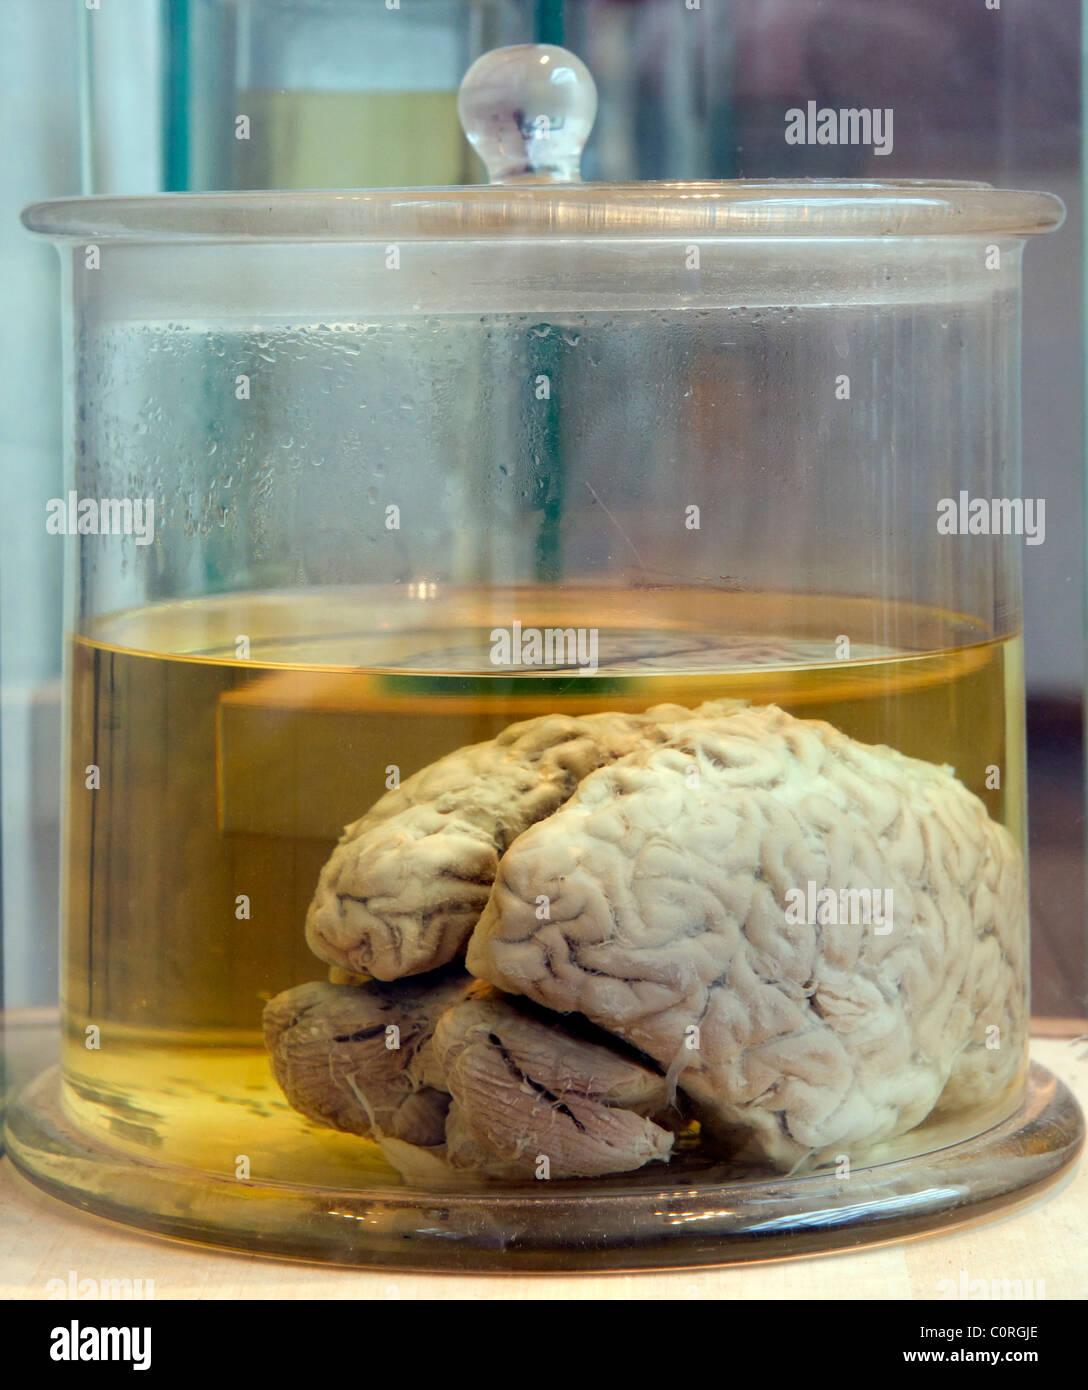 Cerebro Humano real en un frasco de vidrio Imagen De Stock